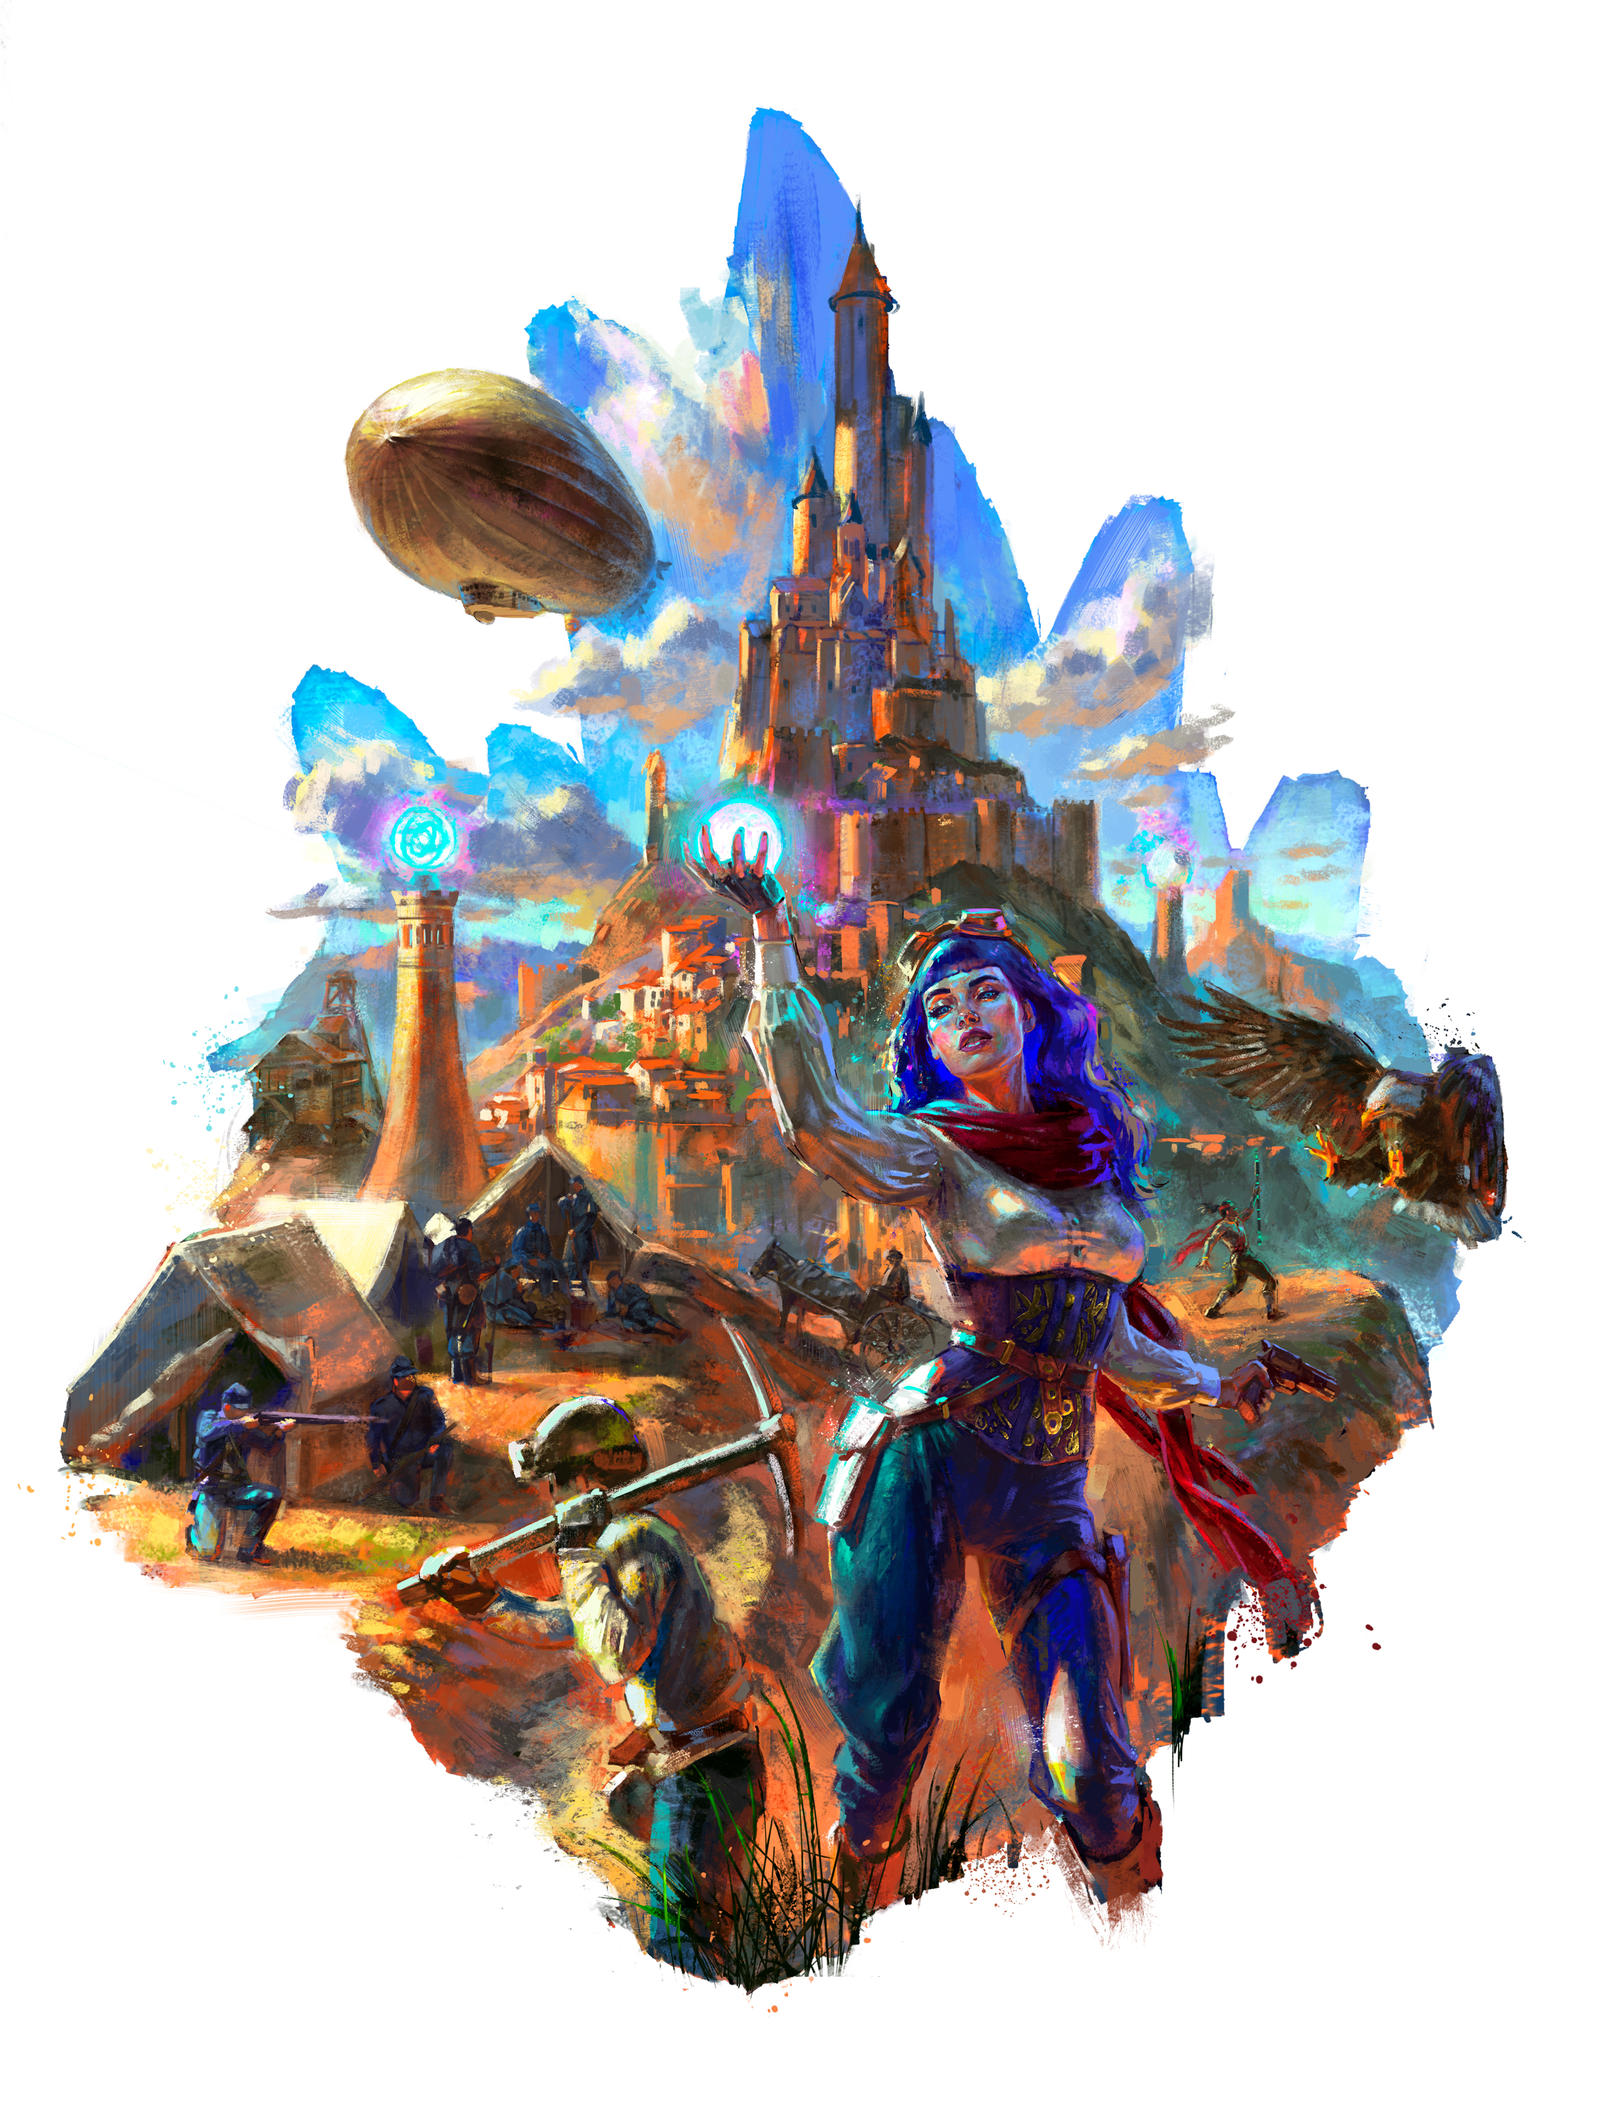 BOREAL GAMES - Promo illustration